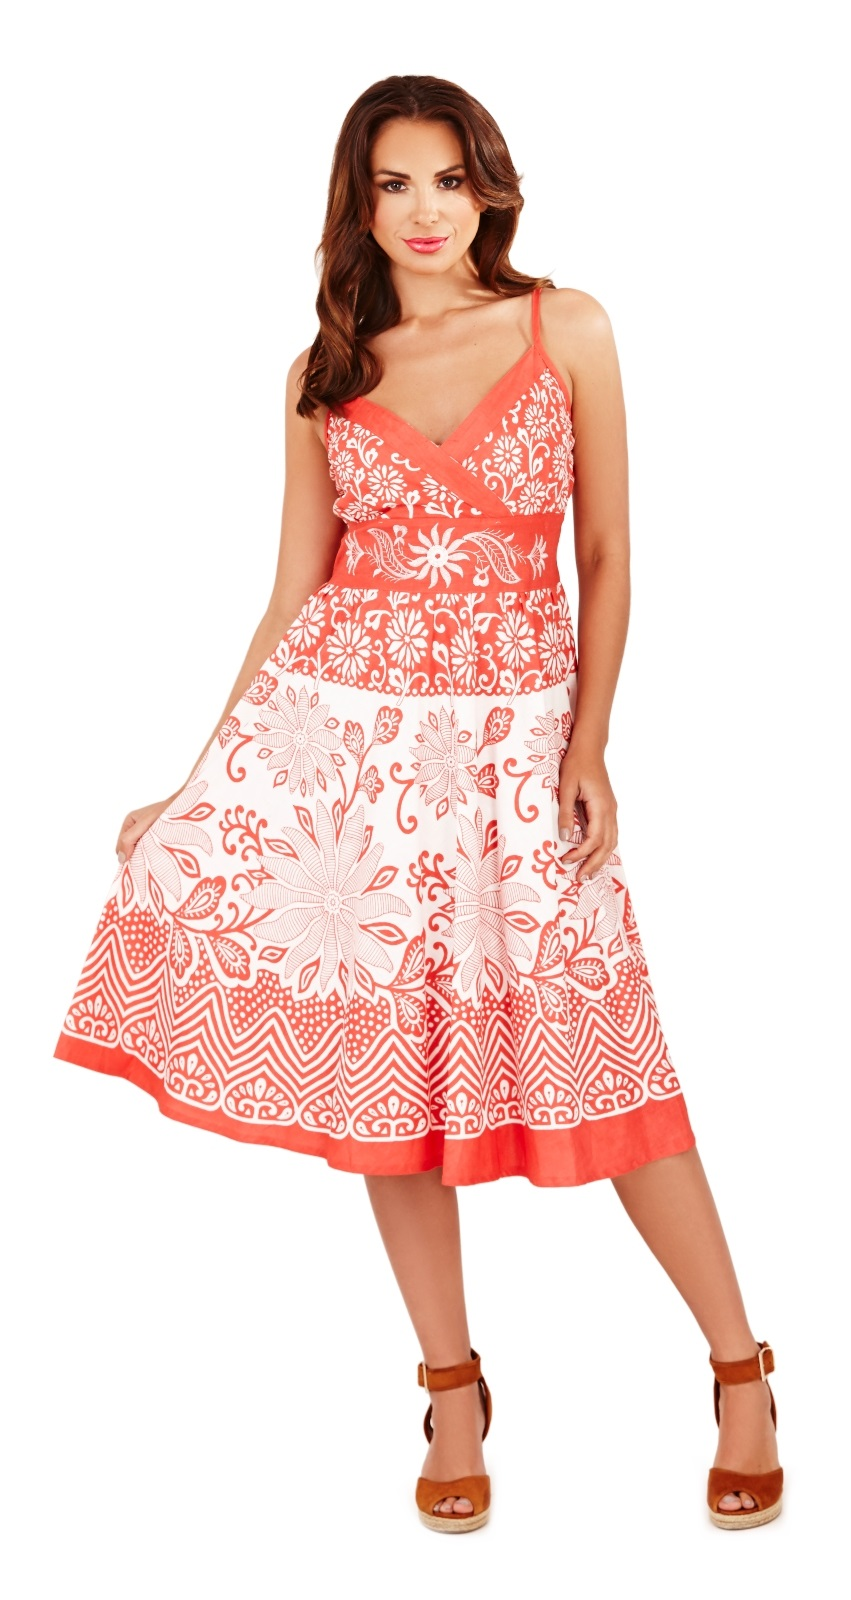 Womens Summer Dress 100% Cotton V Neck Floral Mid Length